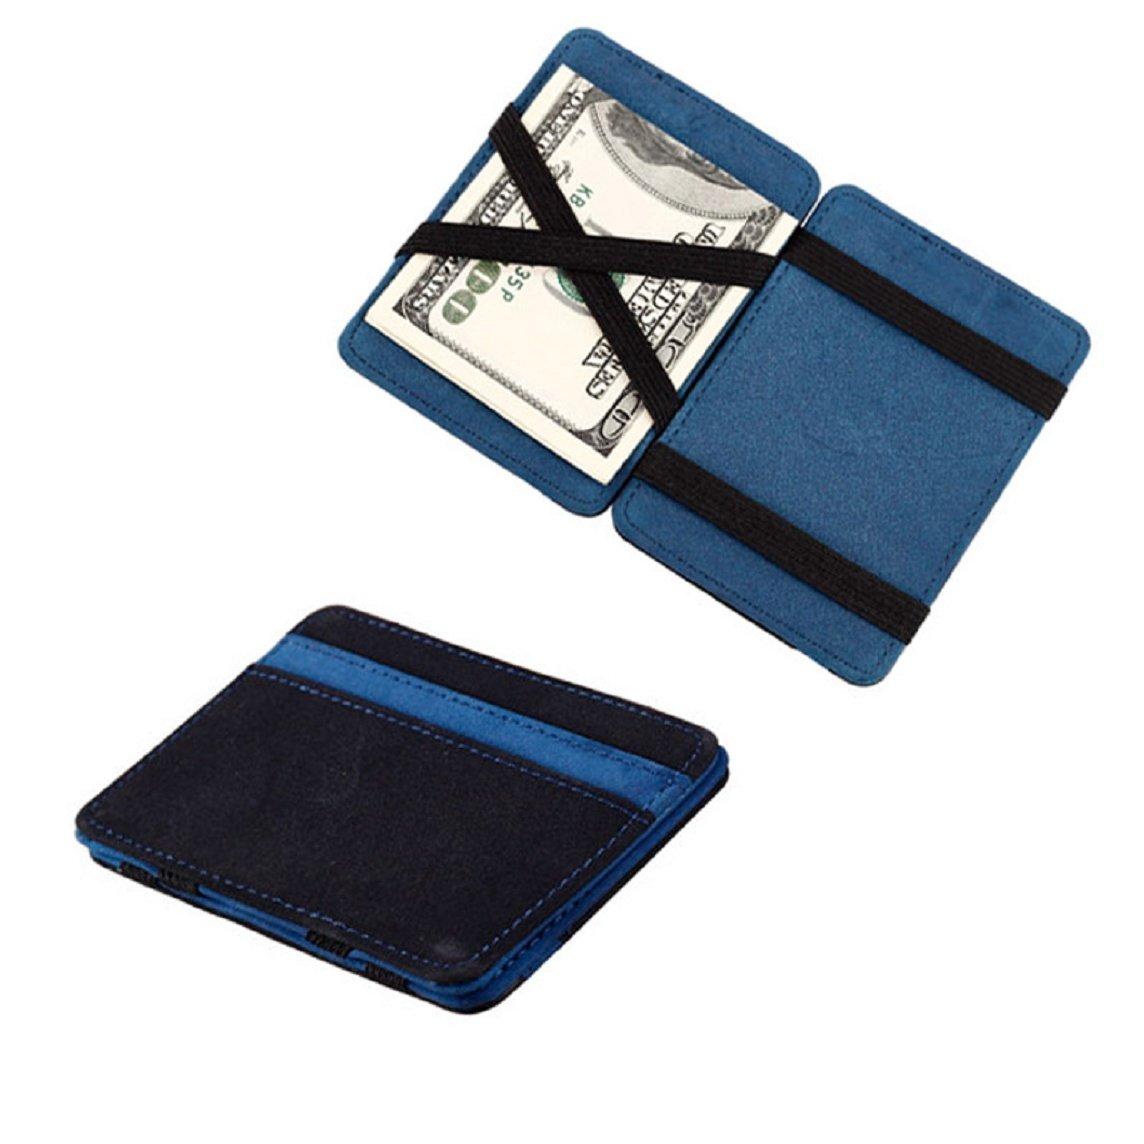 Wallet; Purse;Wallet Purse-Bessky® Mini Neutral Grind Magic Bifold Leather Wallet Card Holder Wallet Purse (Blue)